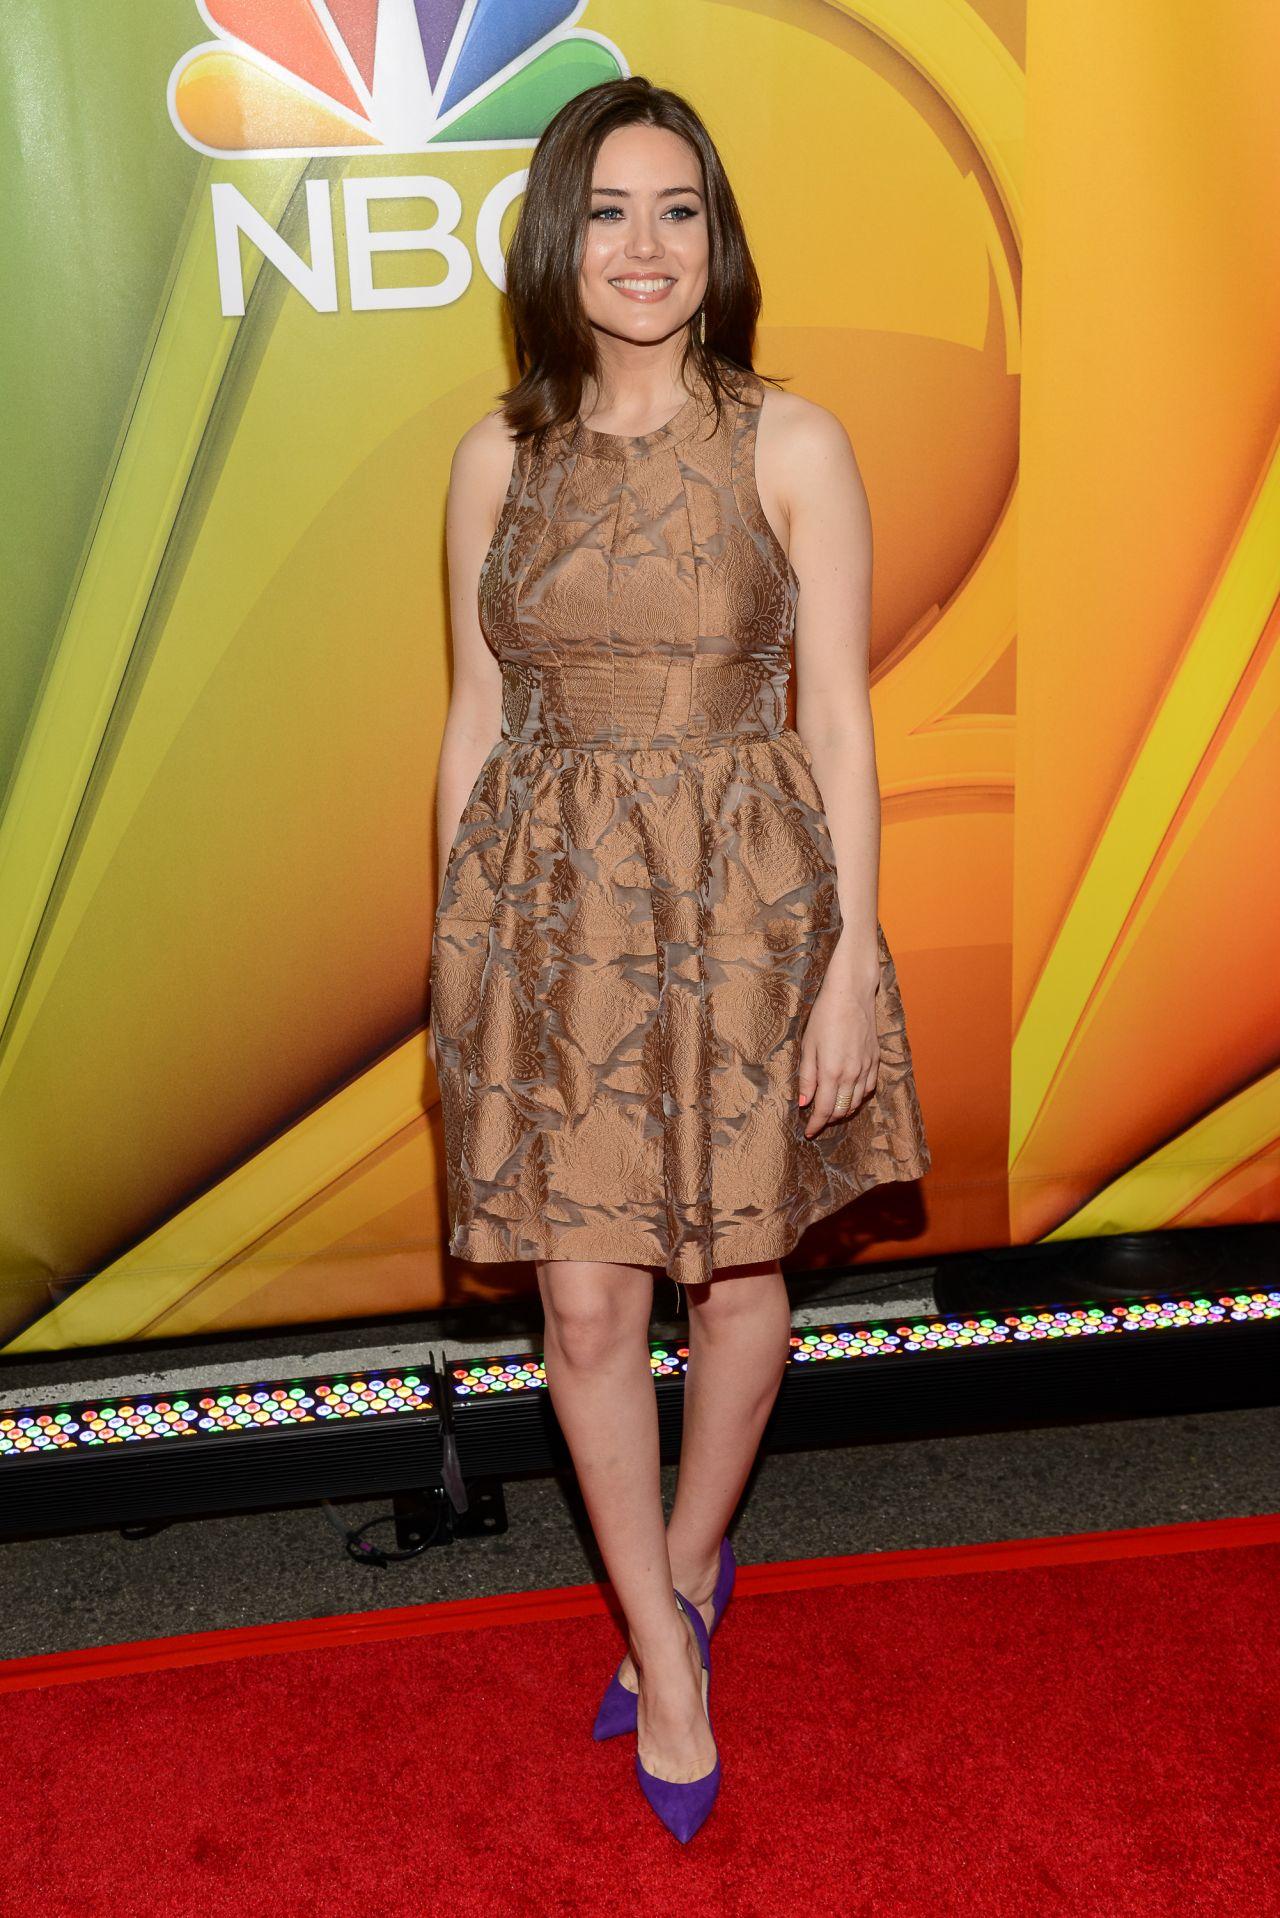 Megan Boone 2015 Nbc Upfront Presentation Radio City